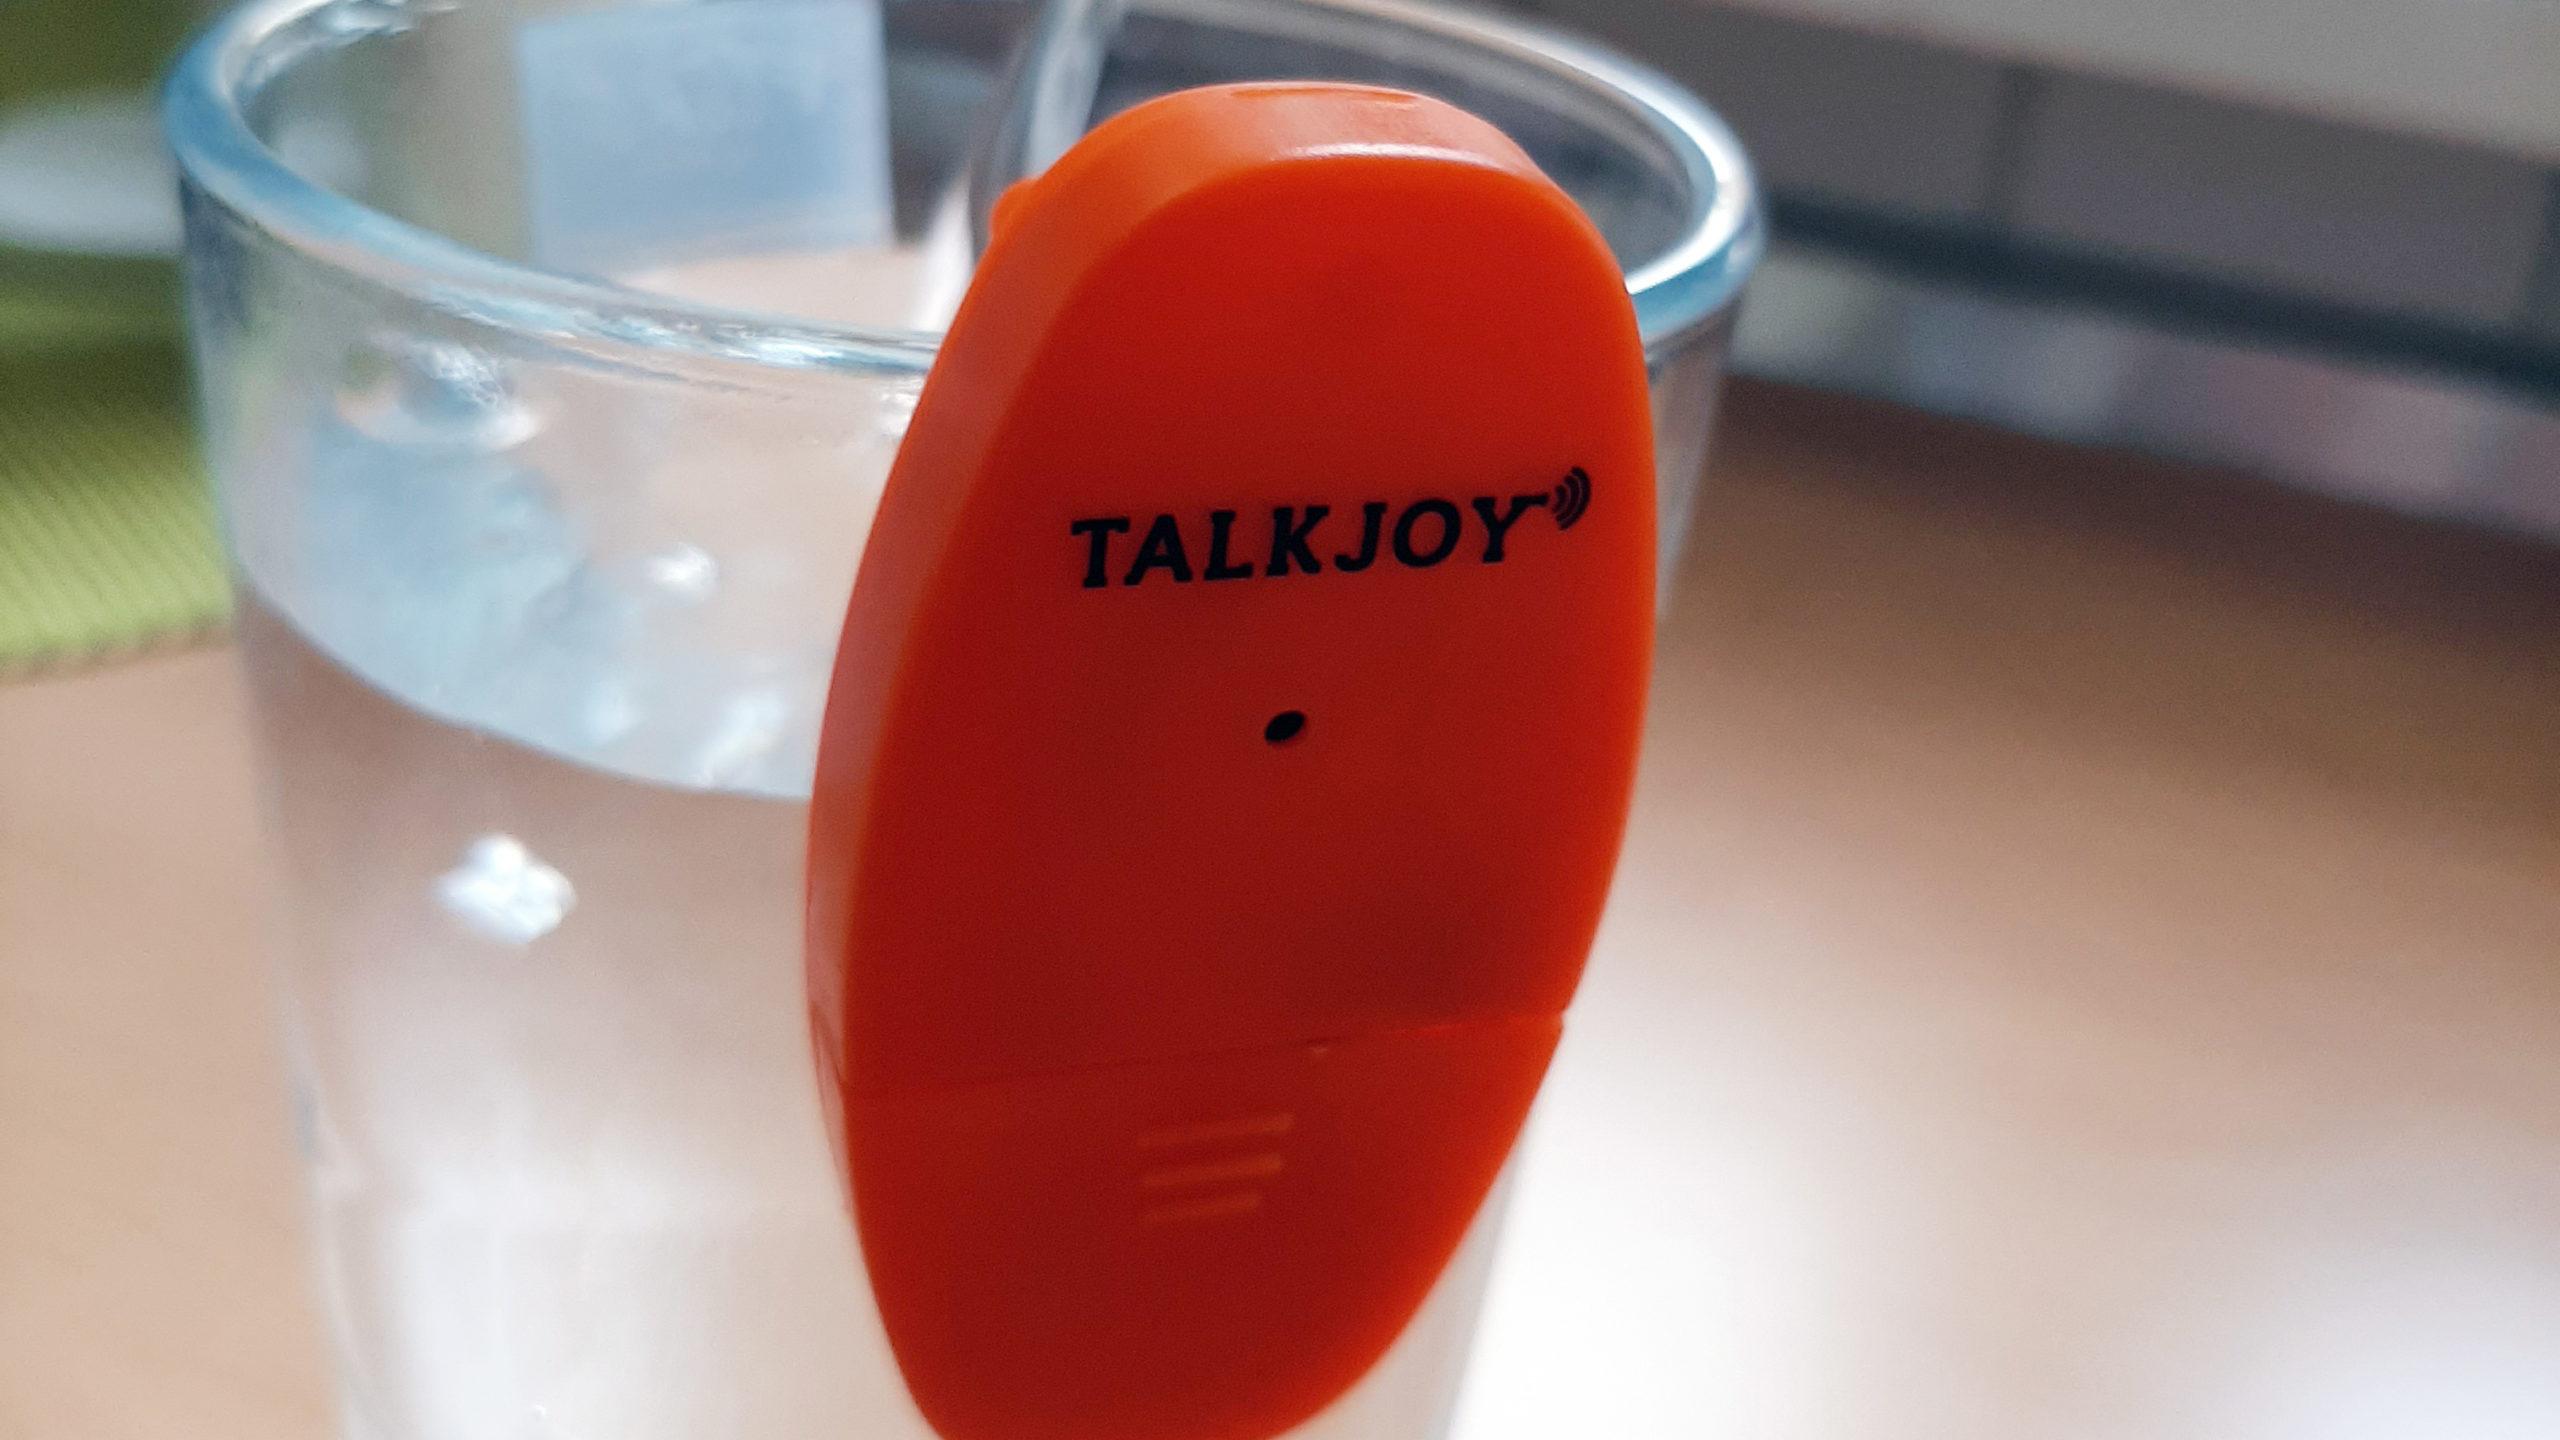 Trinkhilfe Talkjoy für Sehbehinderte